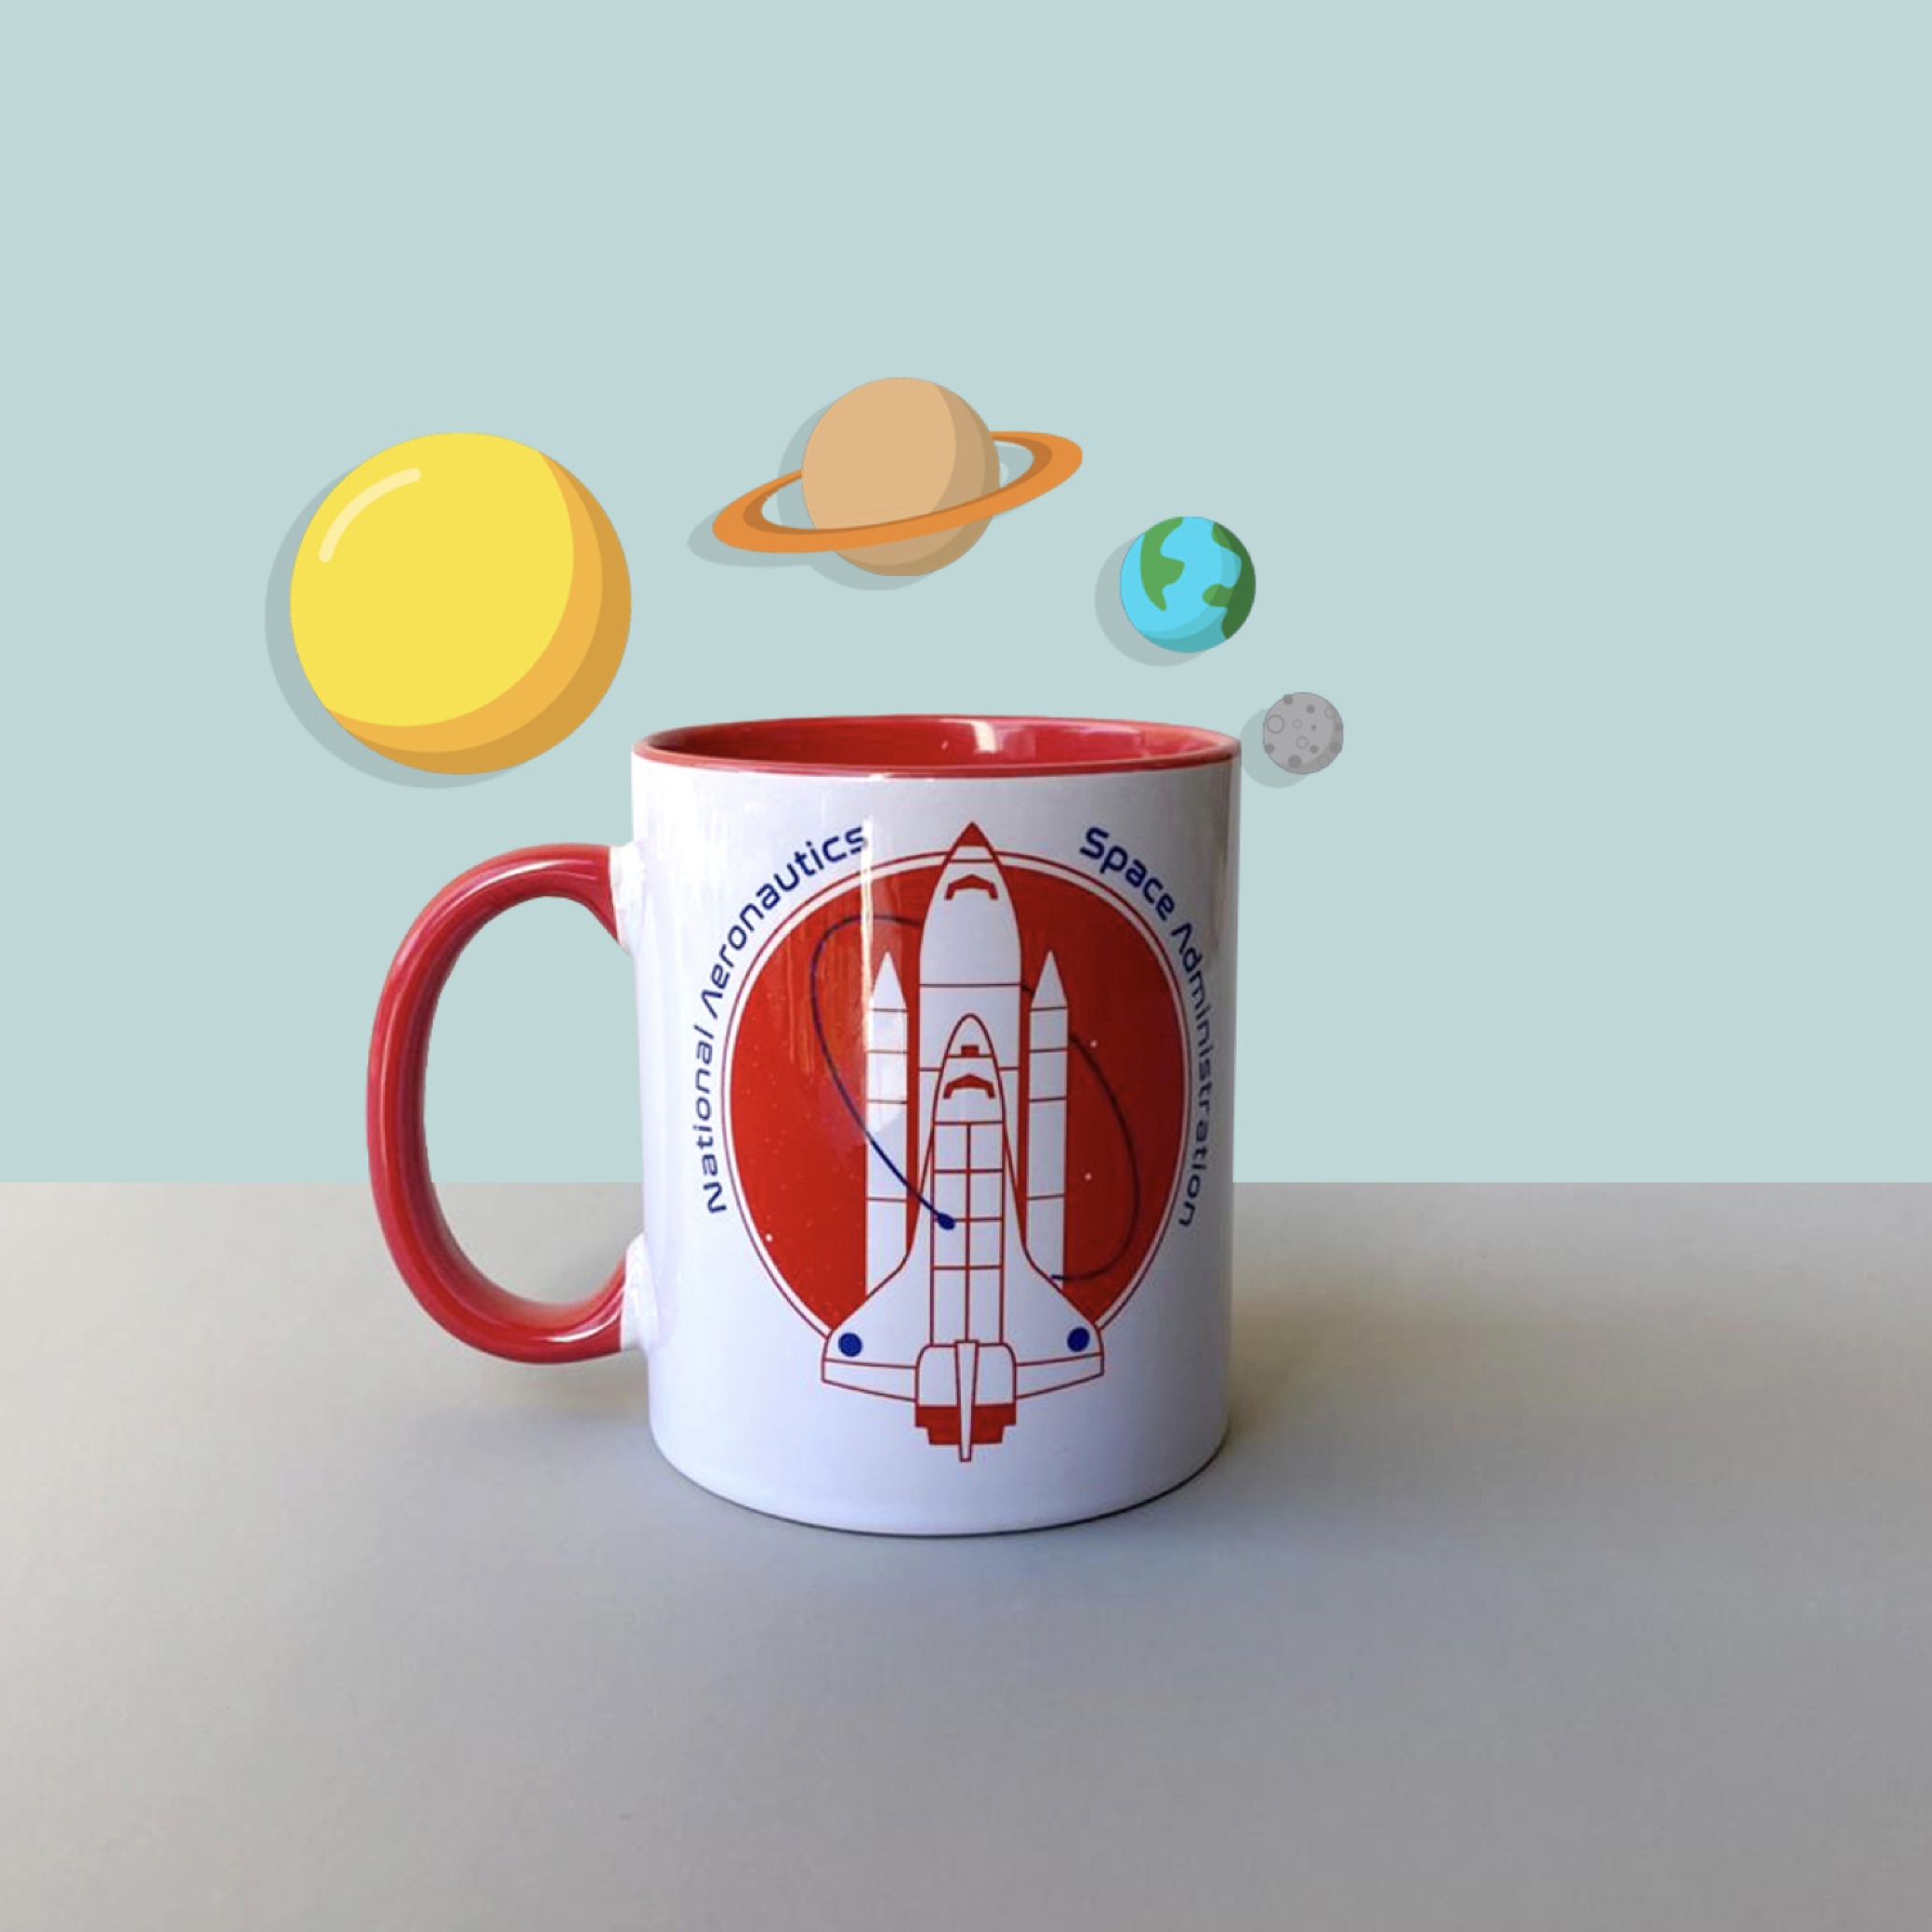 ماگ ناسا